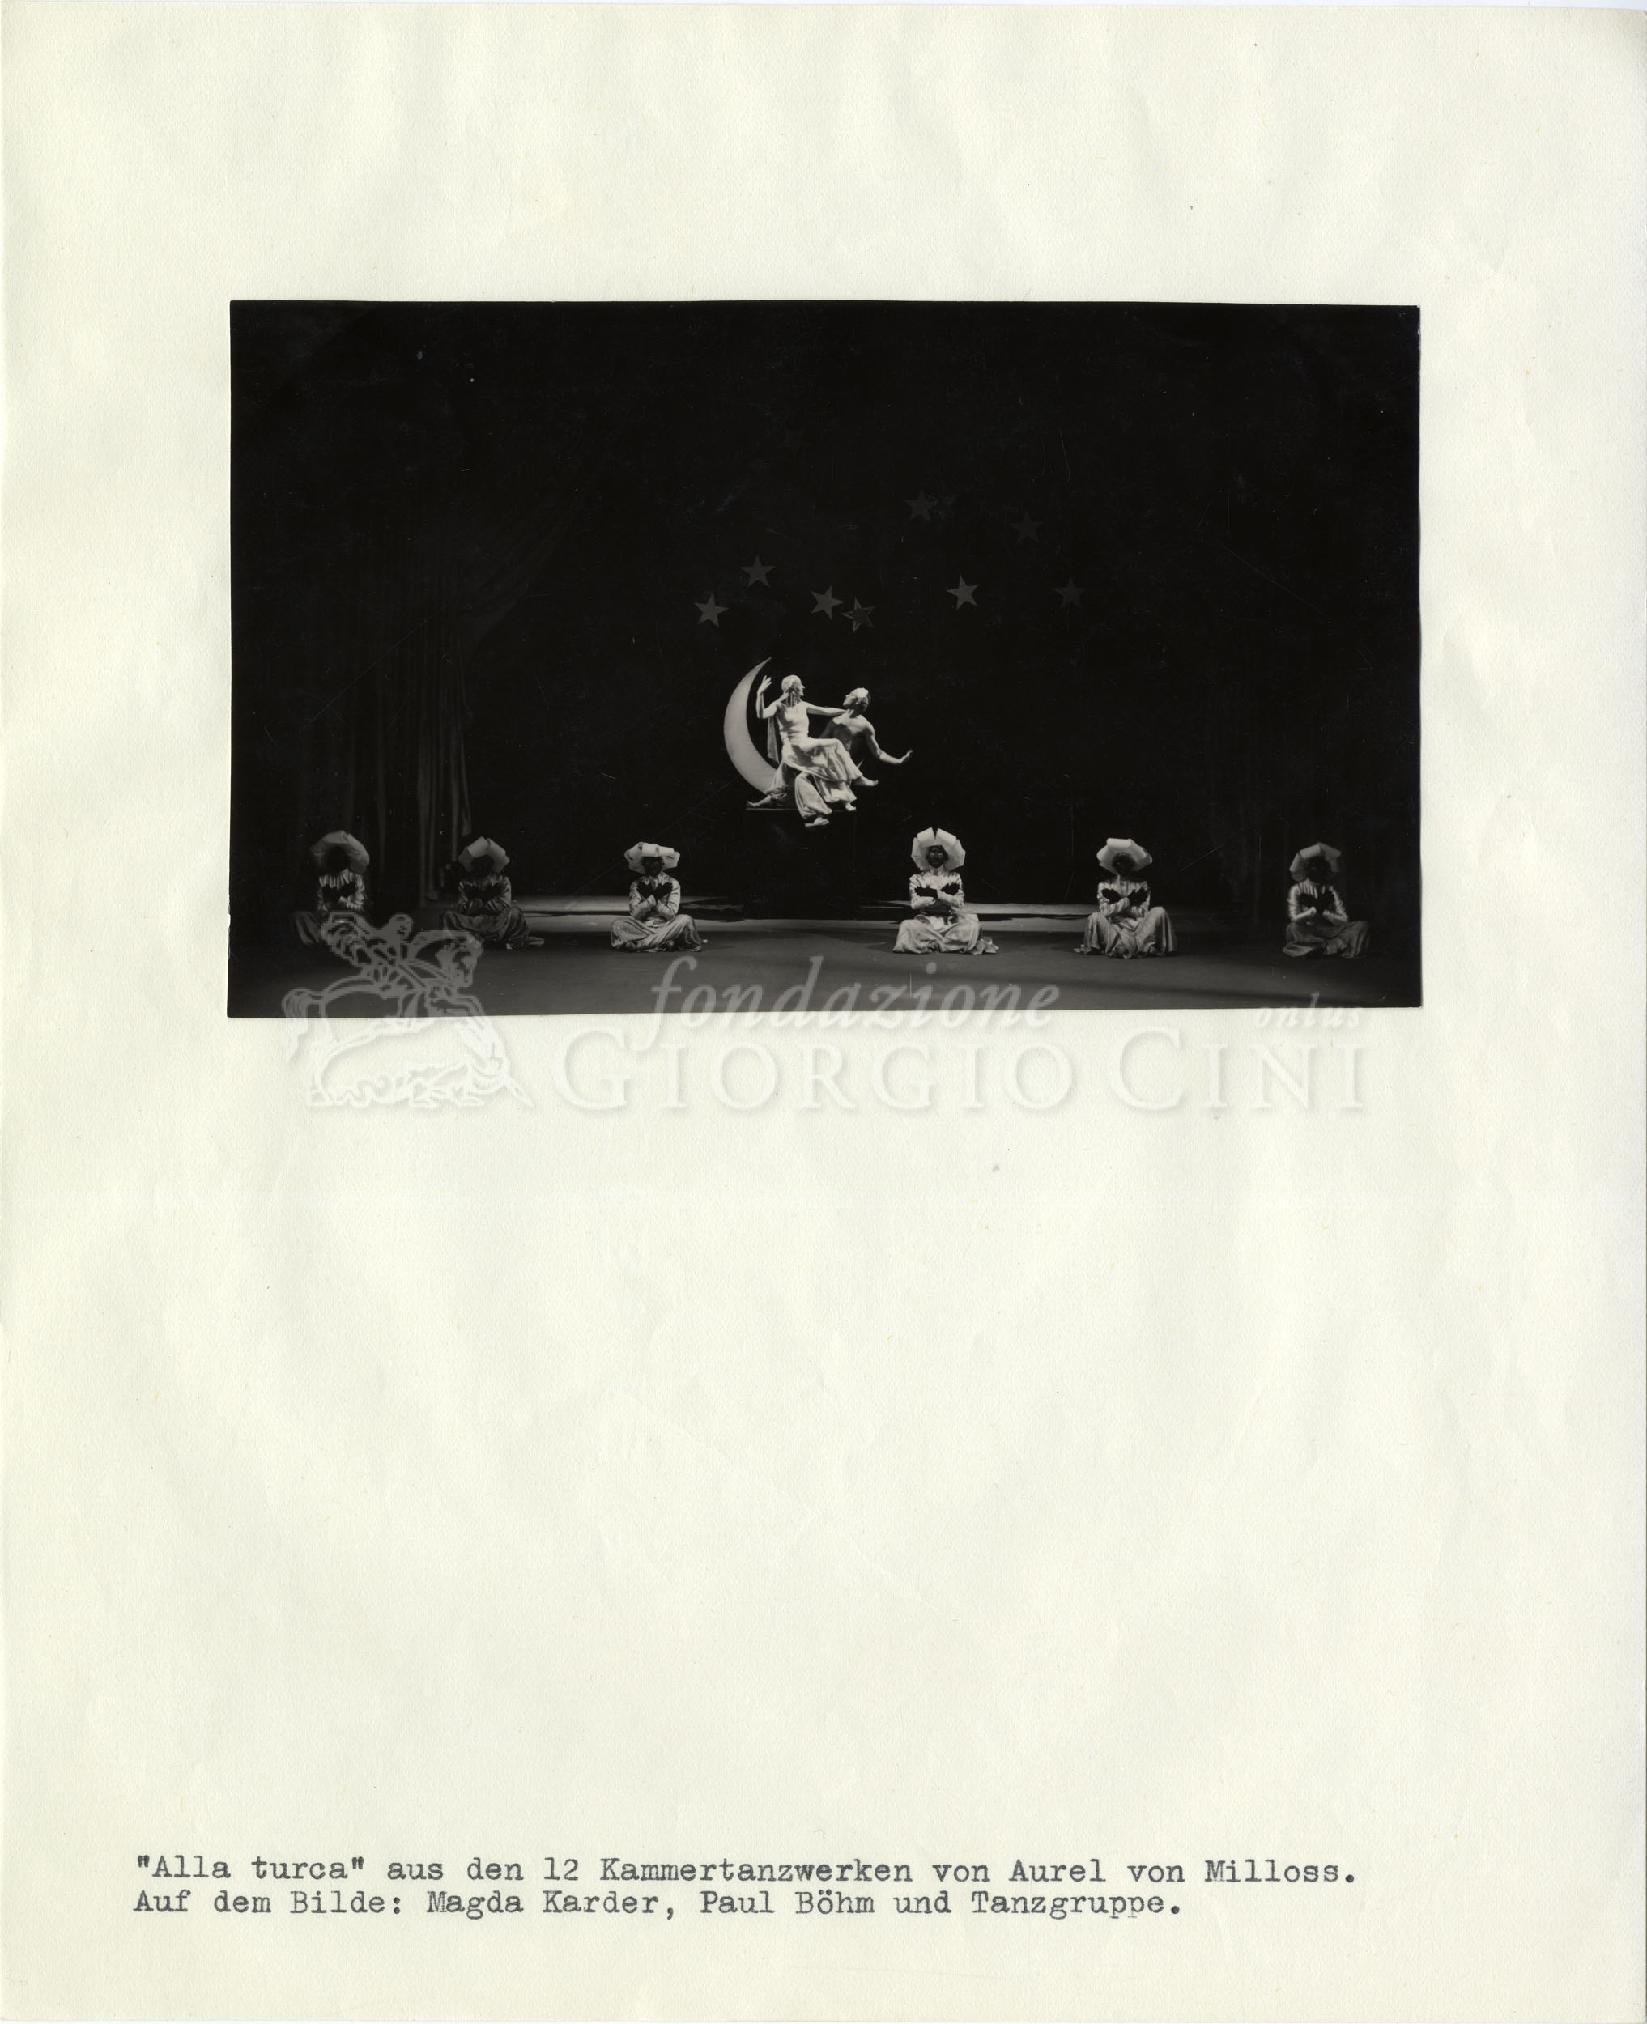 Stampa gelatina ai sali d'argento / carta incollata su foglio